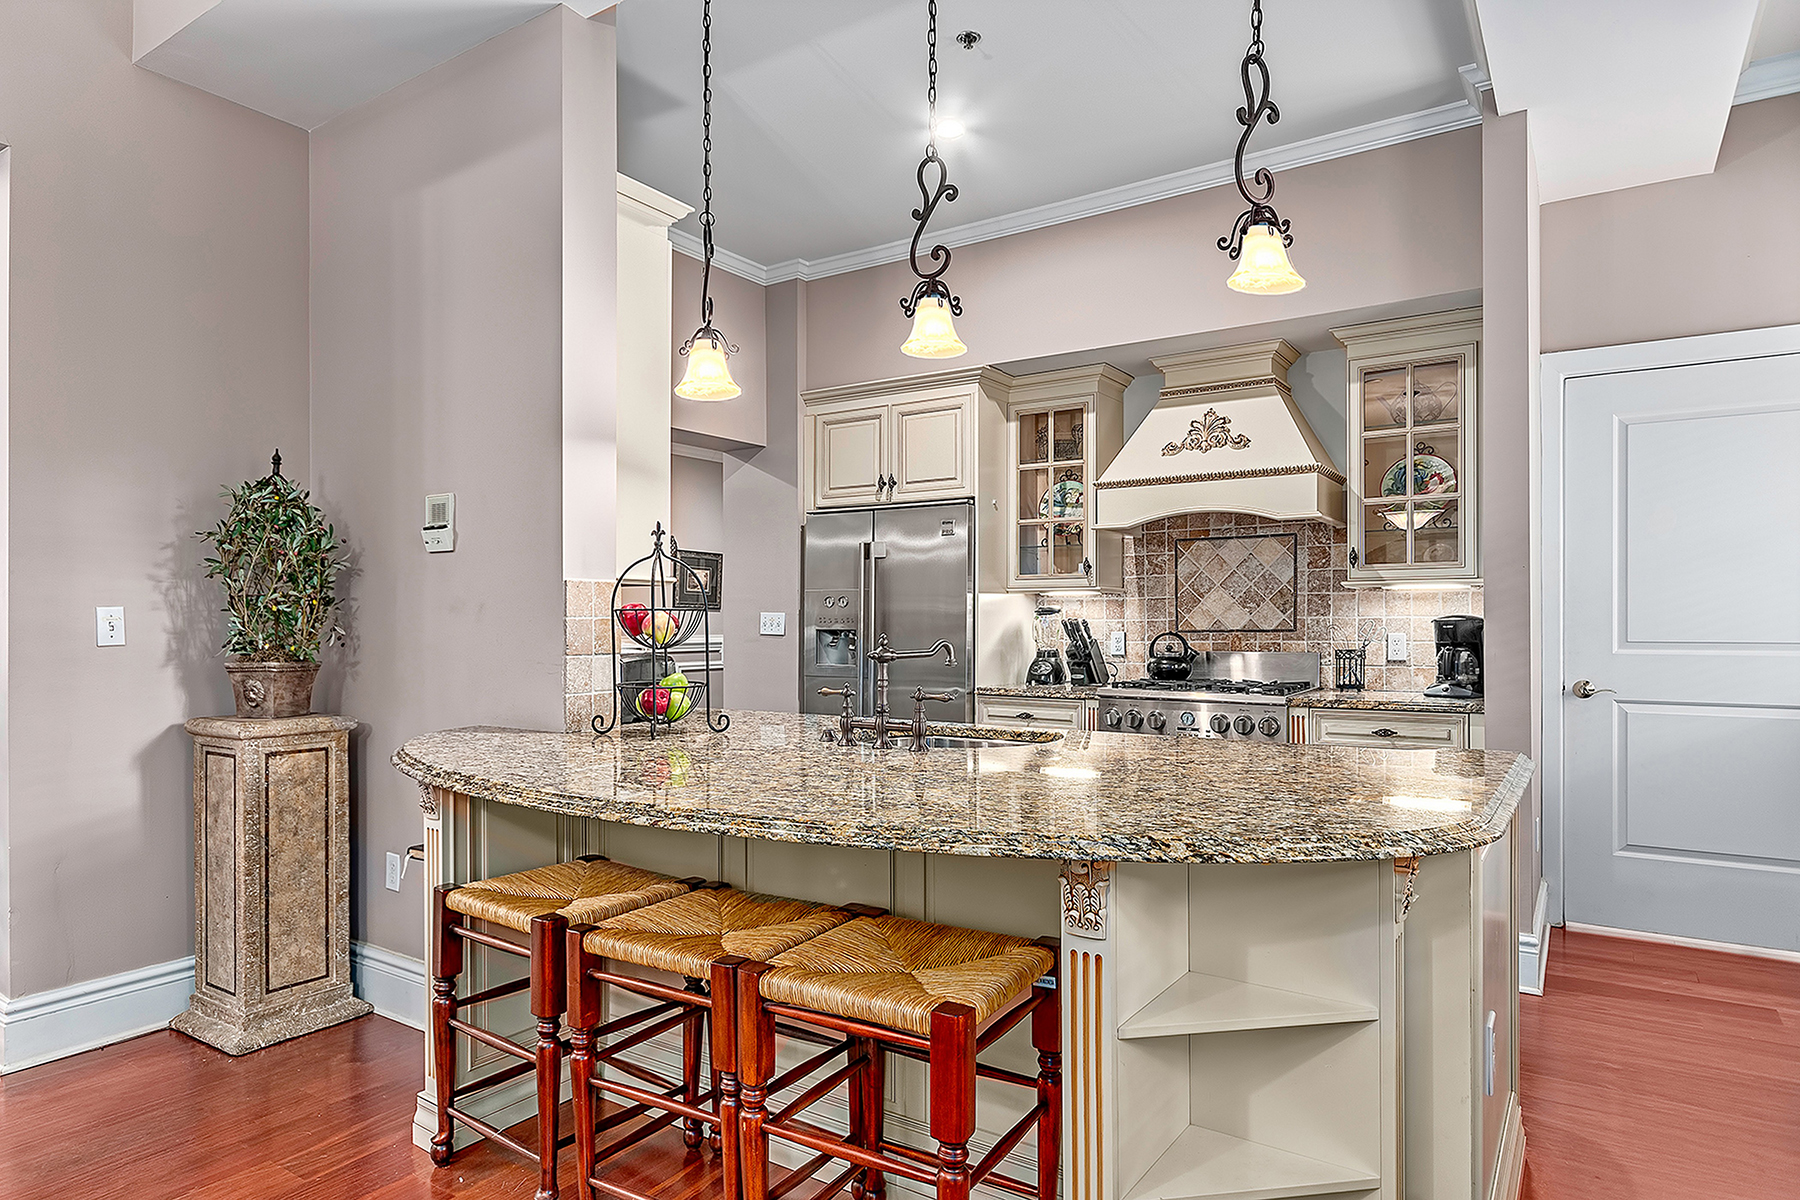 Additional photo for property listing at HISTORIC BILTMORE VILLAGE CONDO COMPLEX 8  Village Ln,  Asheville, North Carolina 28803 United States